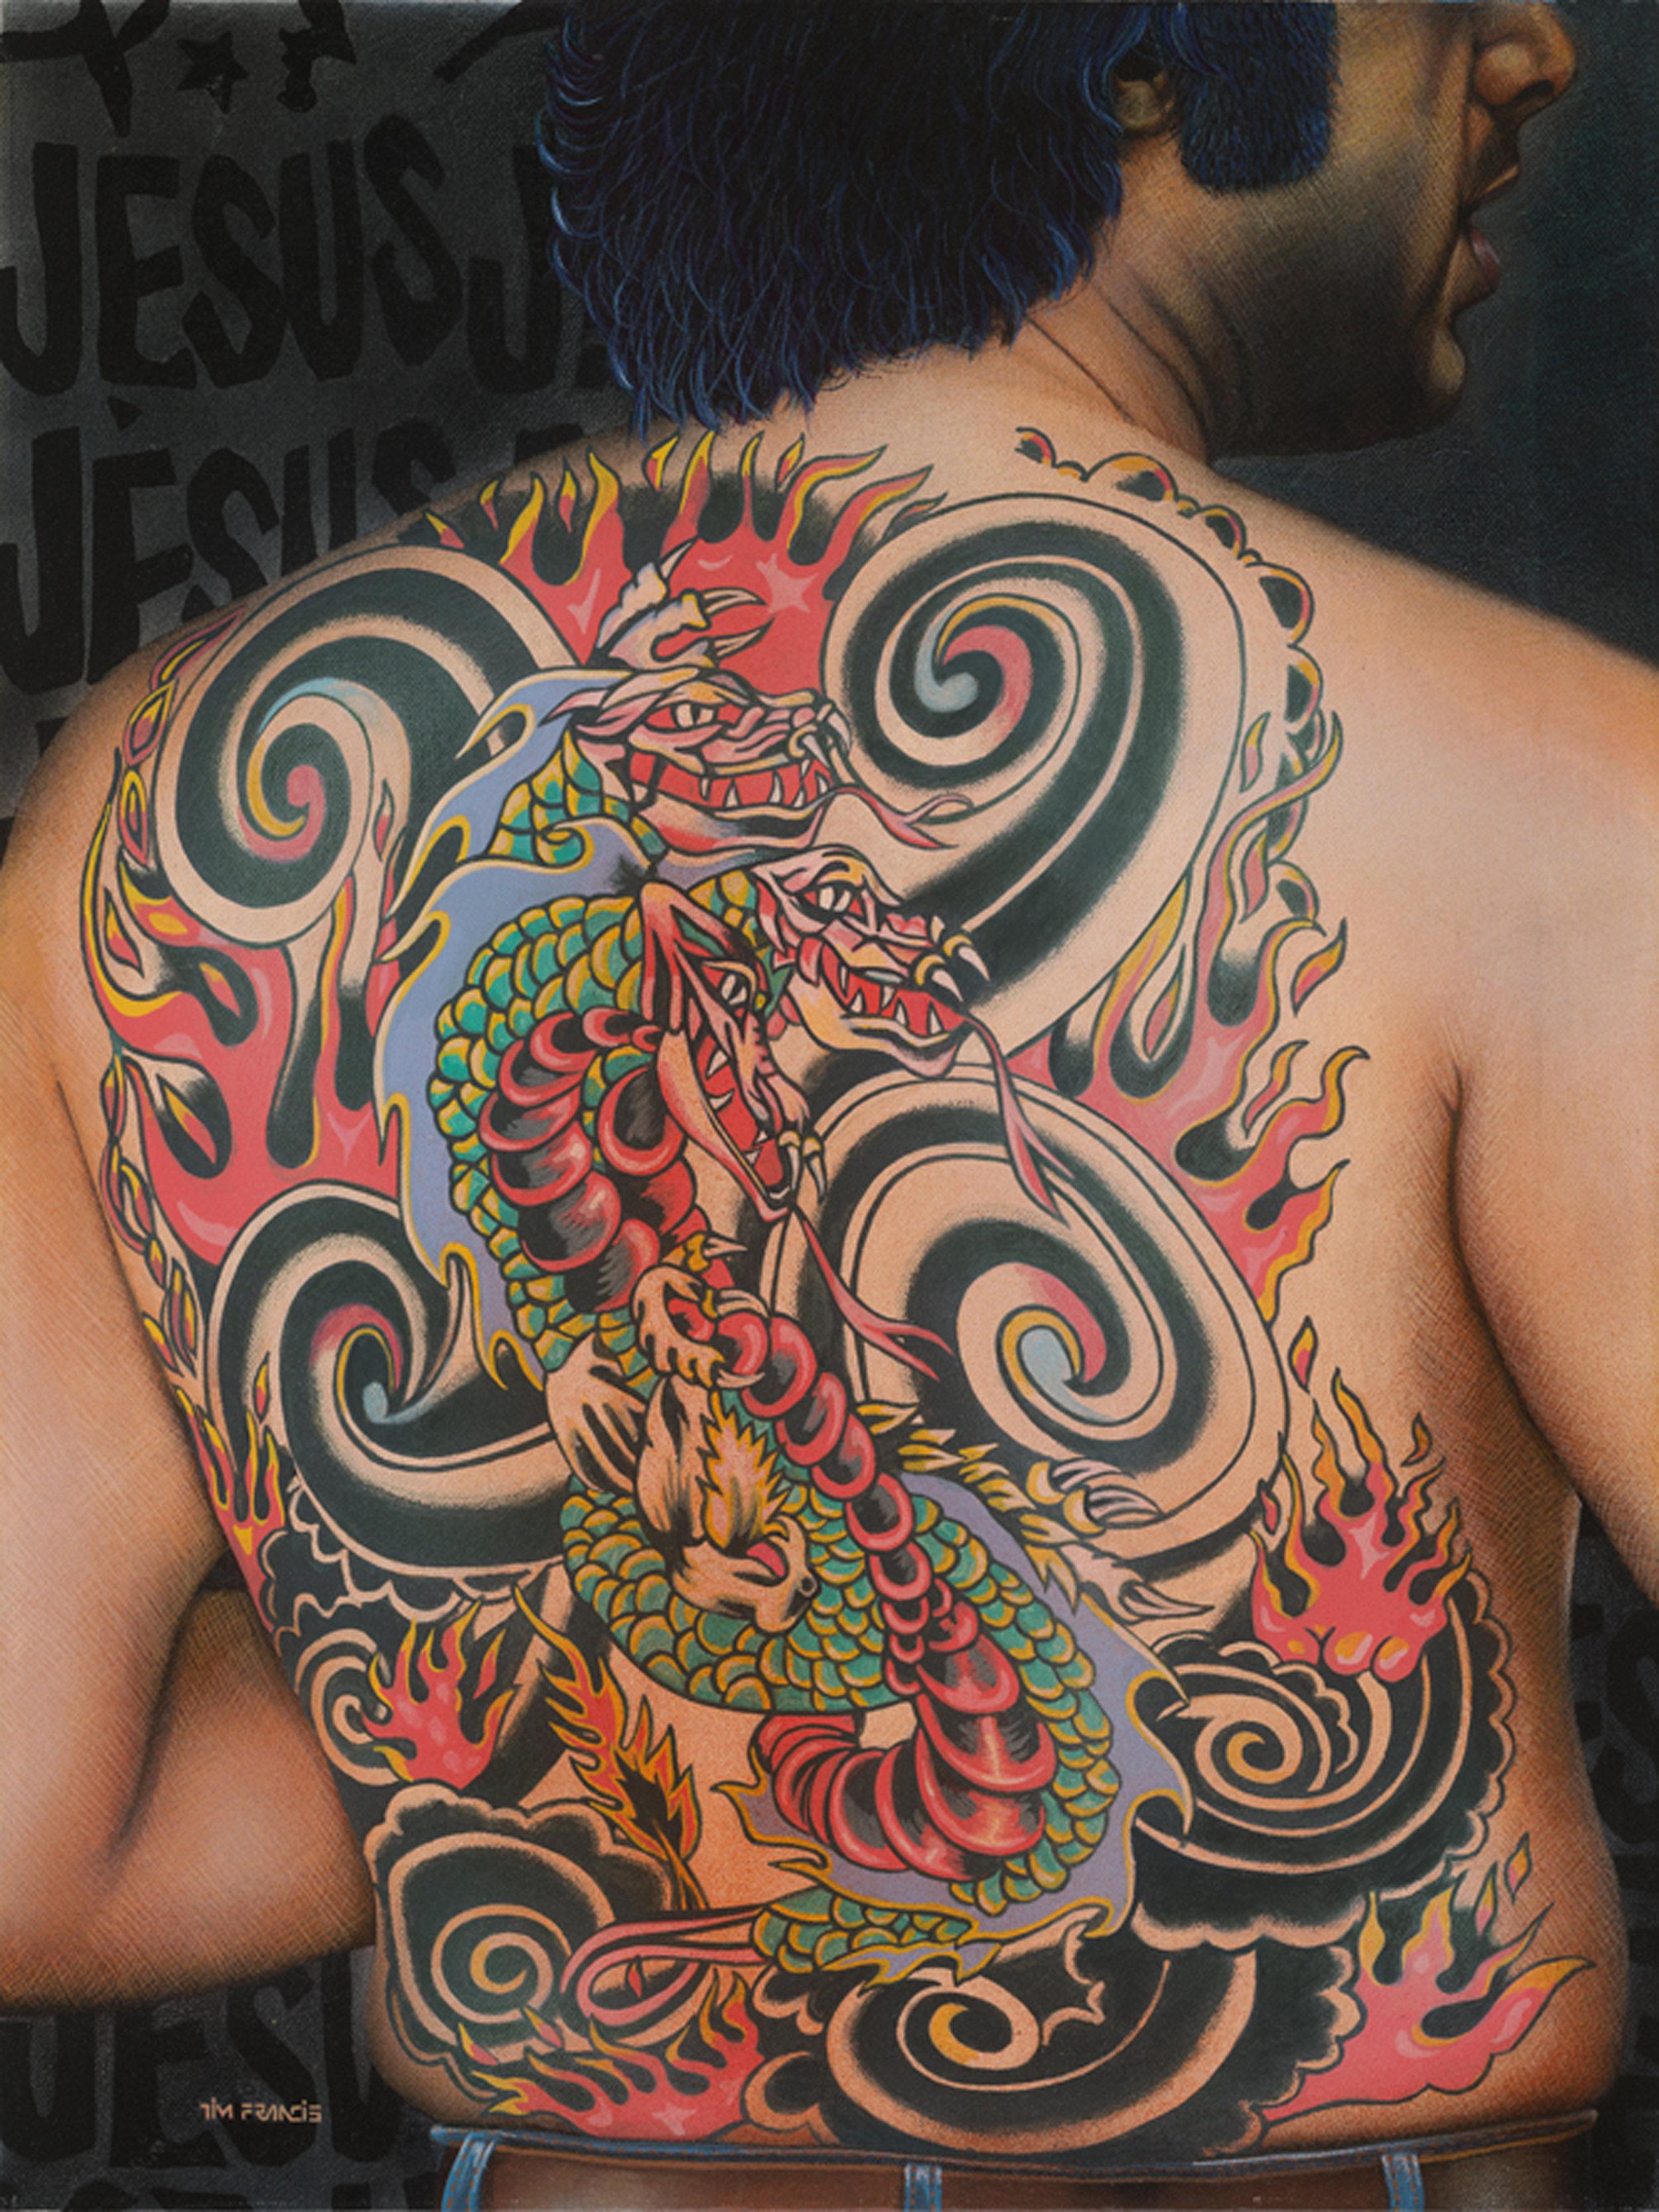 tatoo-24x18.jpg